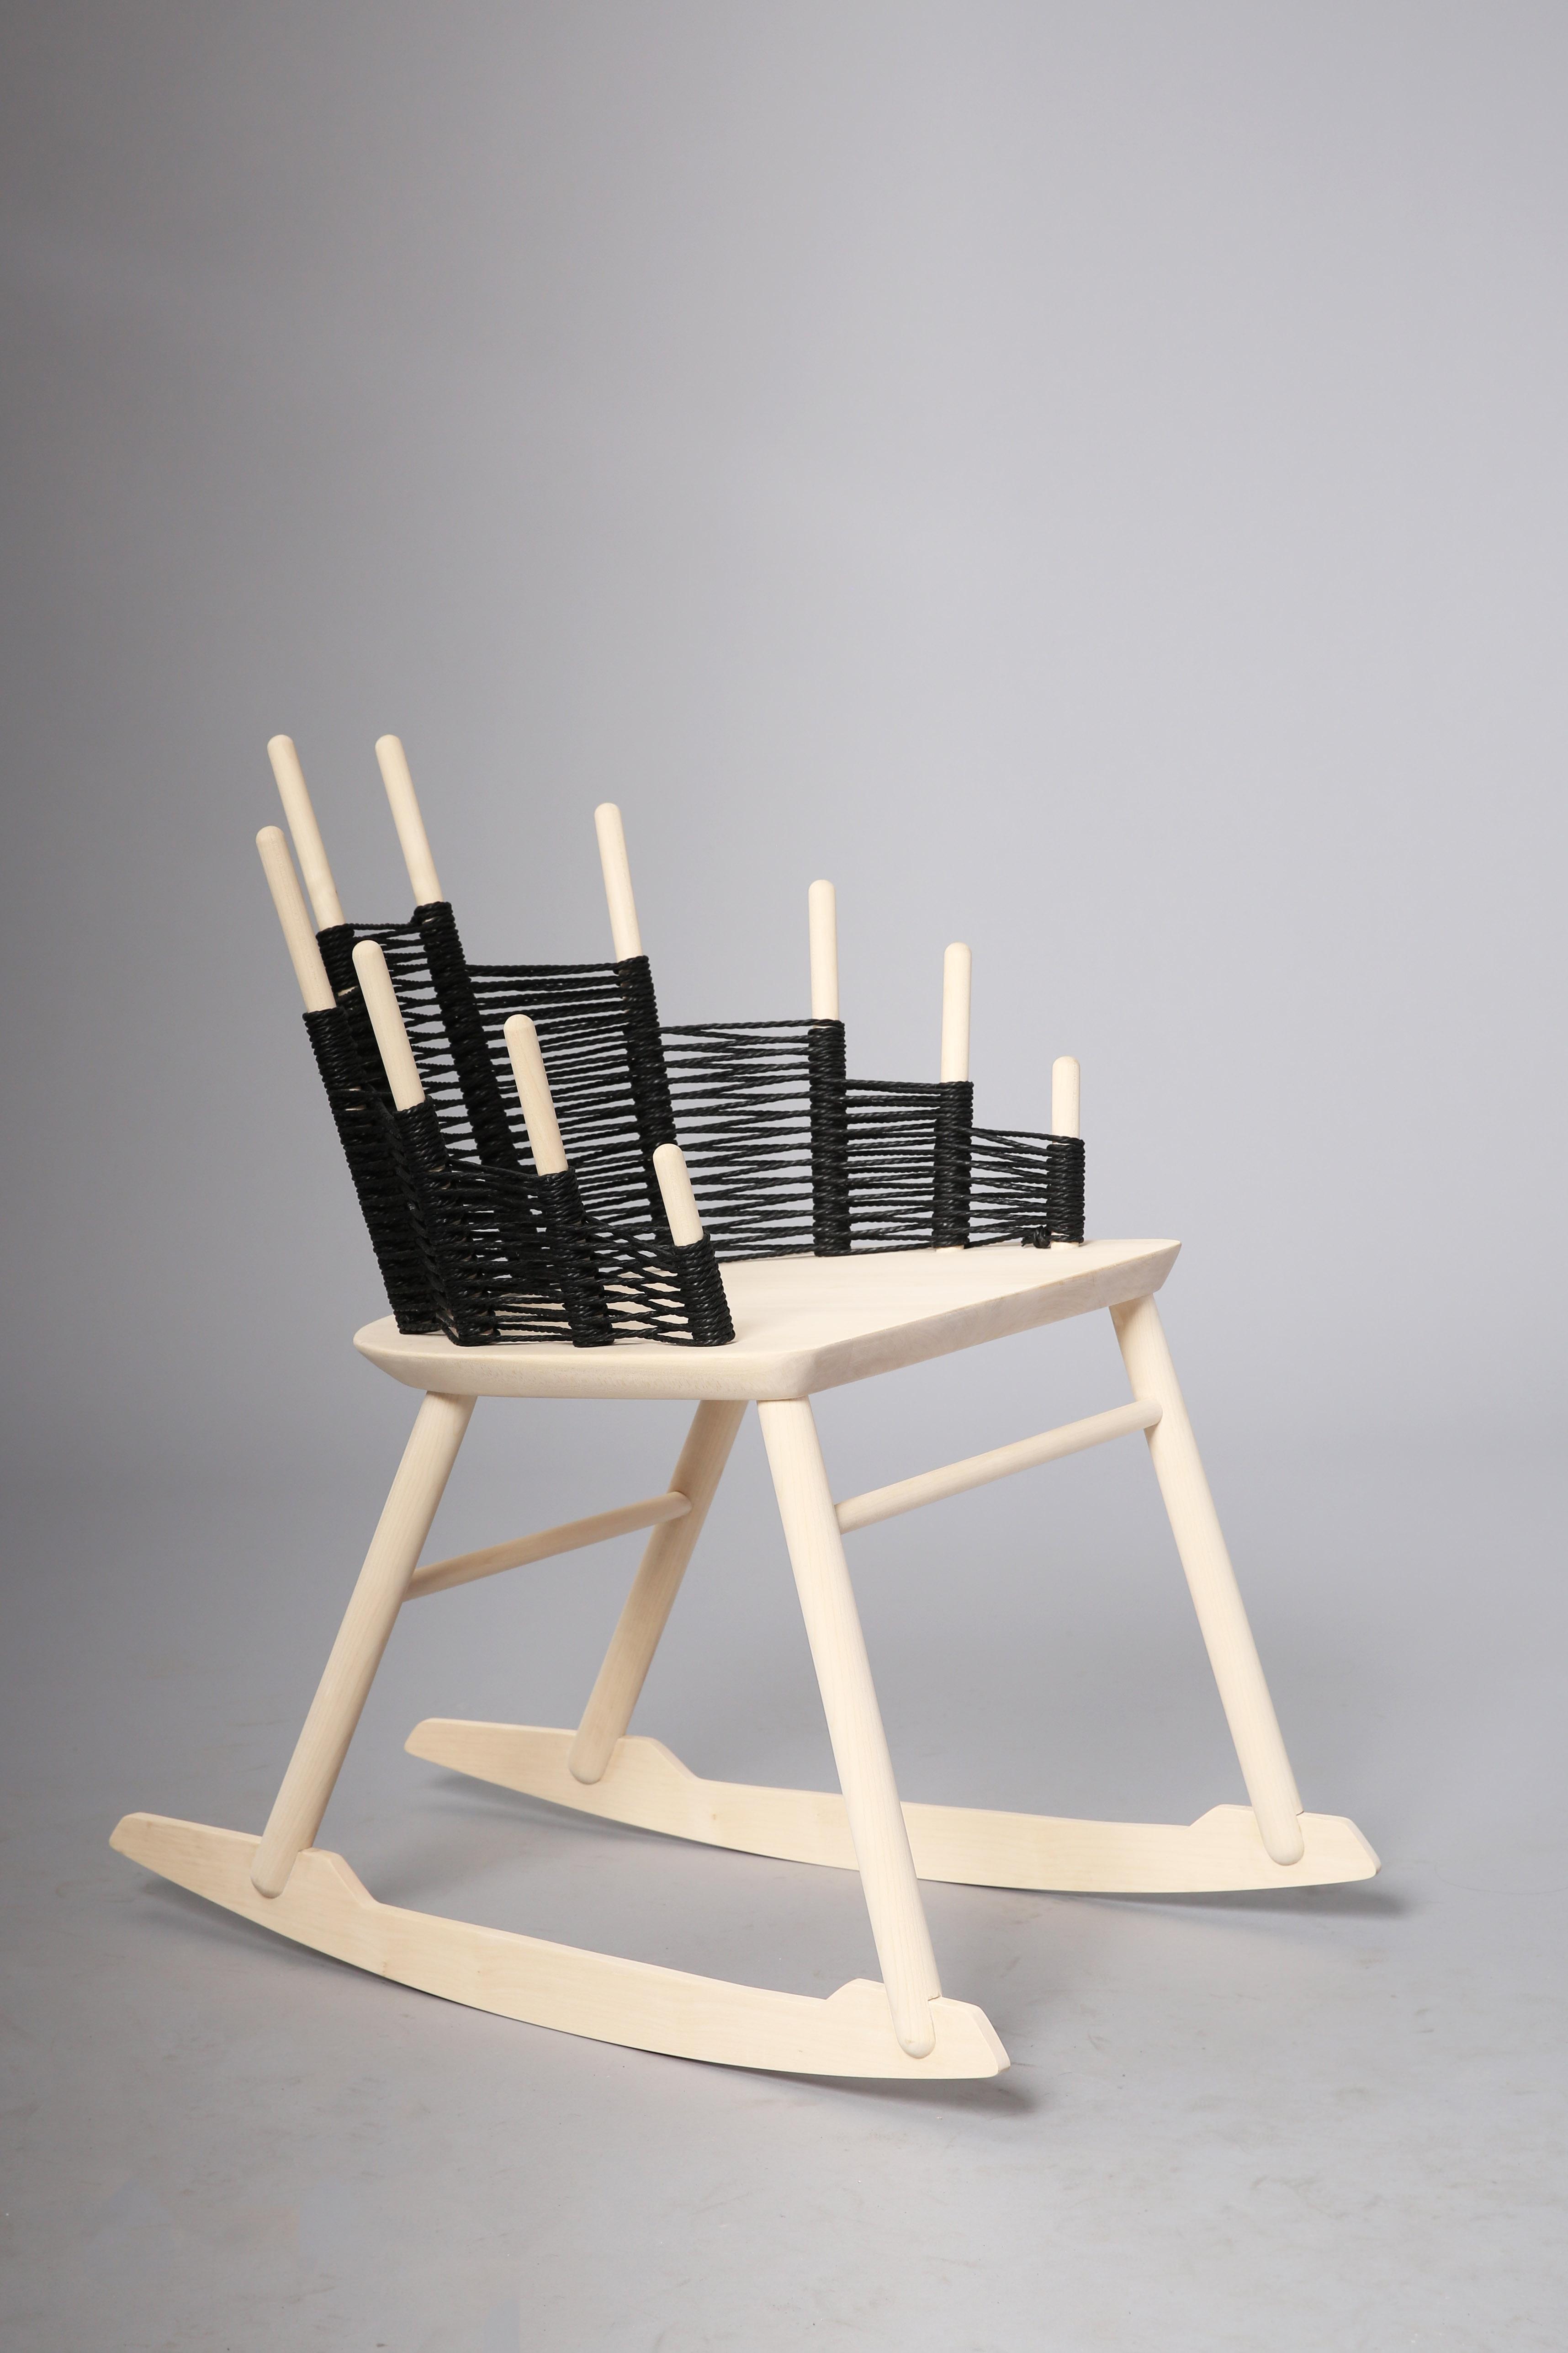 Rook Rocking Chair by Michael Regan